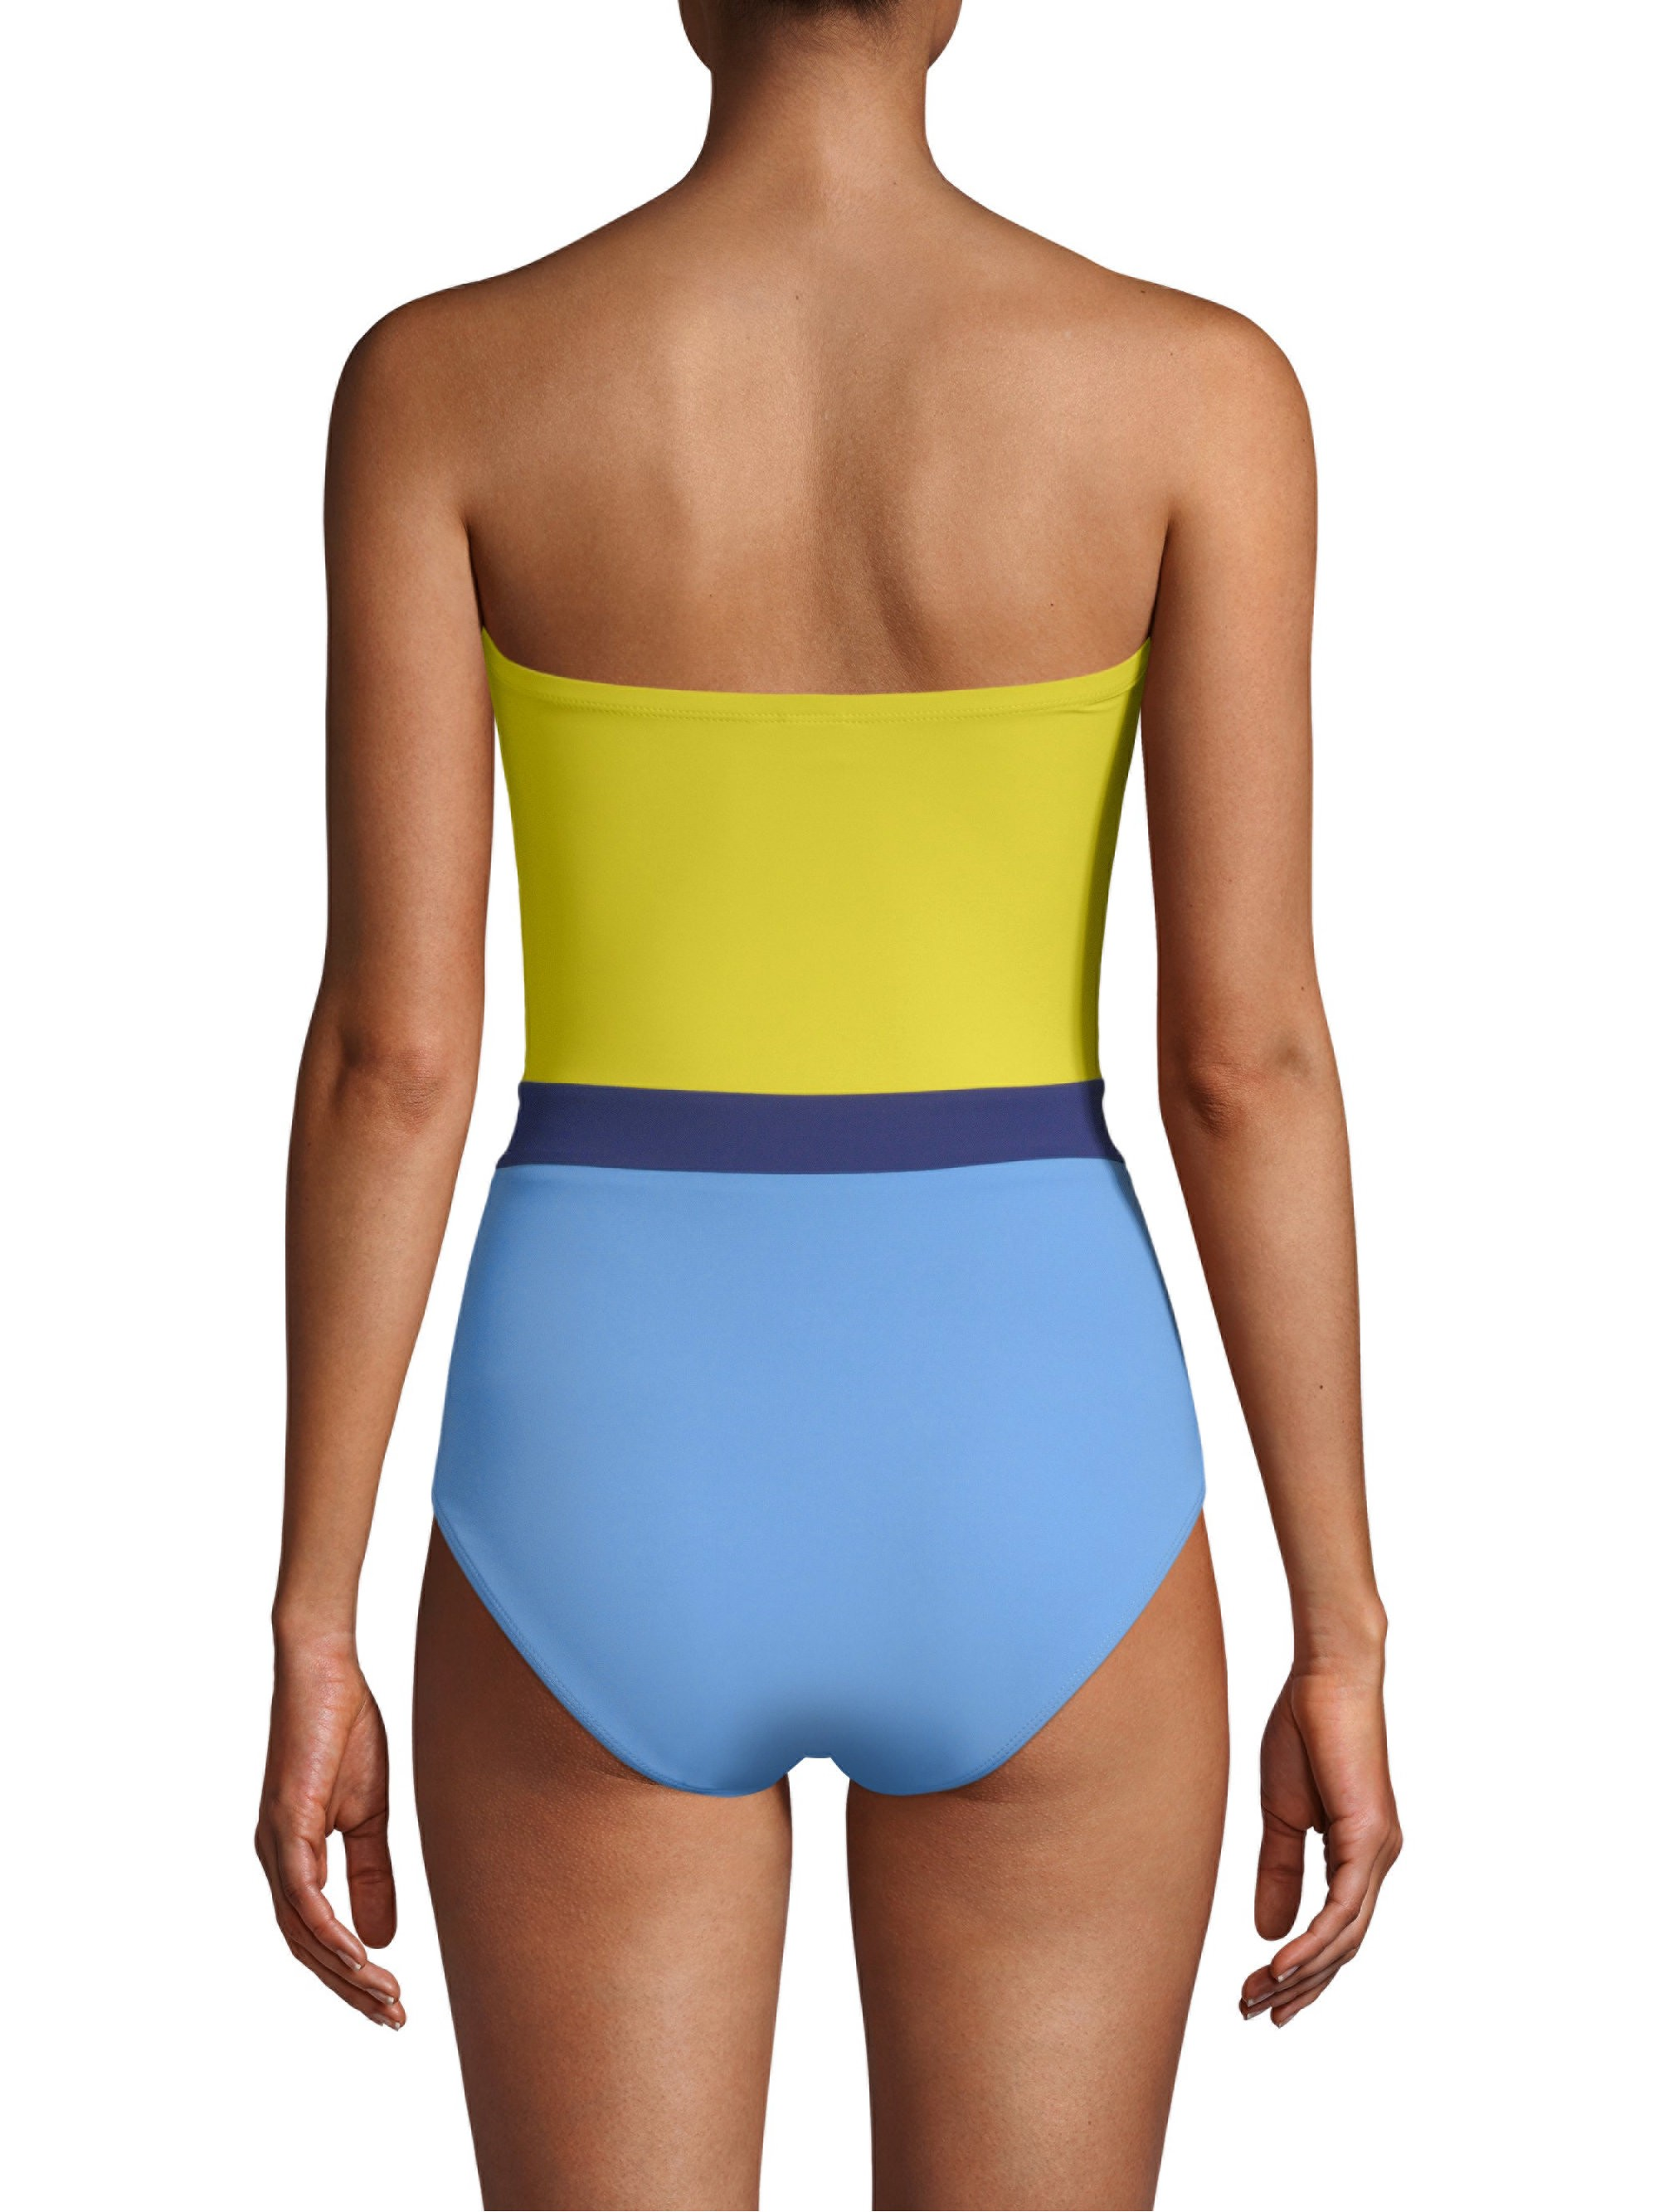 0d4165895e8 Flagpole Rita One-Piece Swimsuit - White Key Medium | Products ...